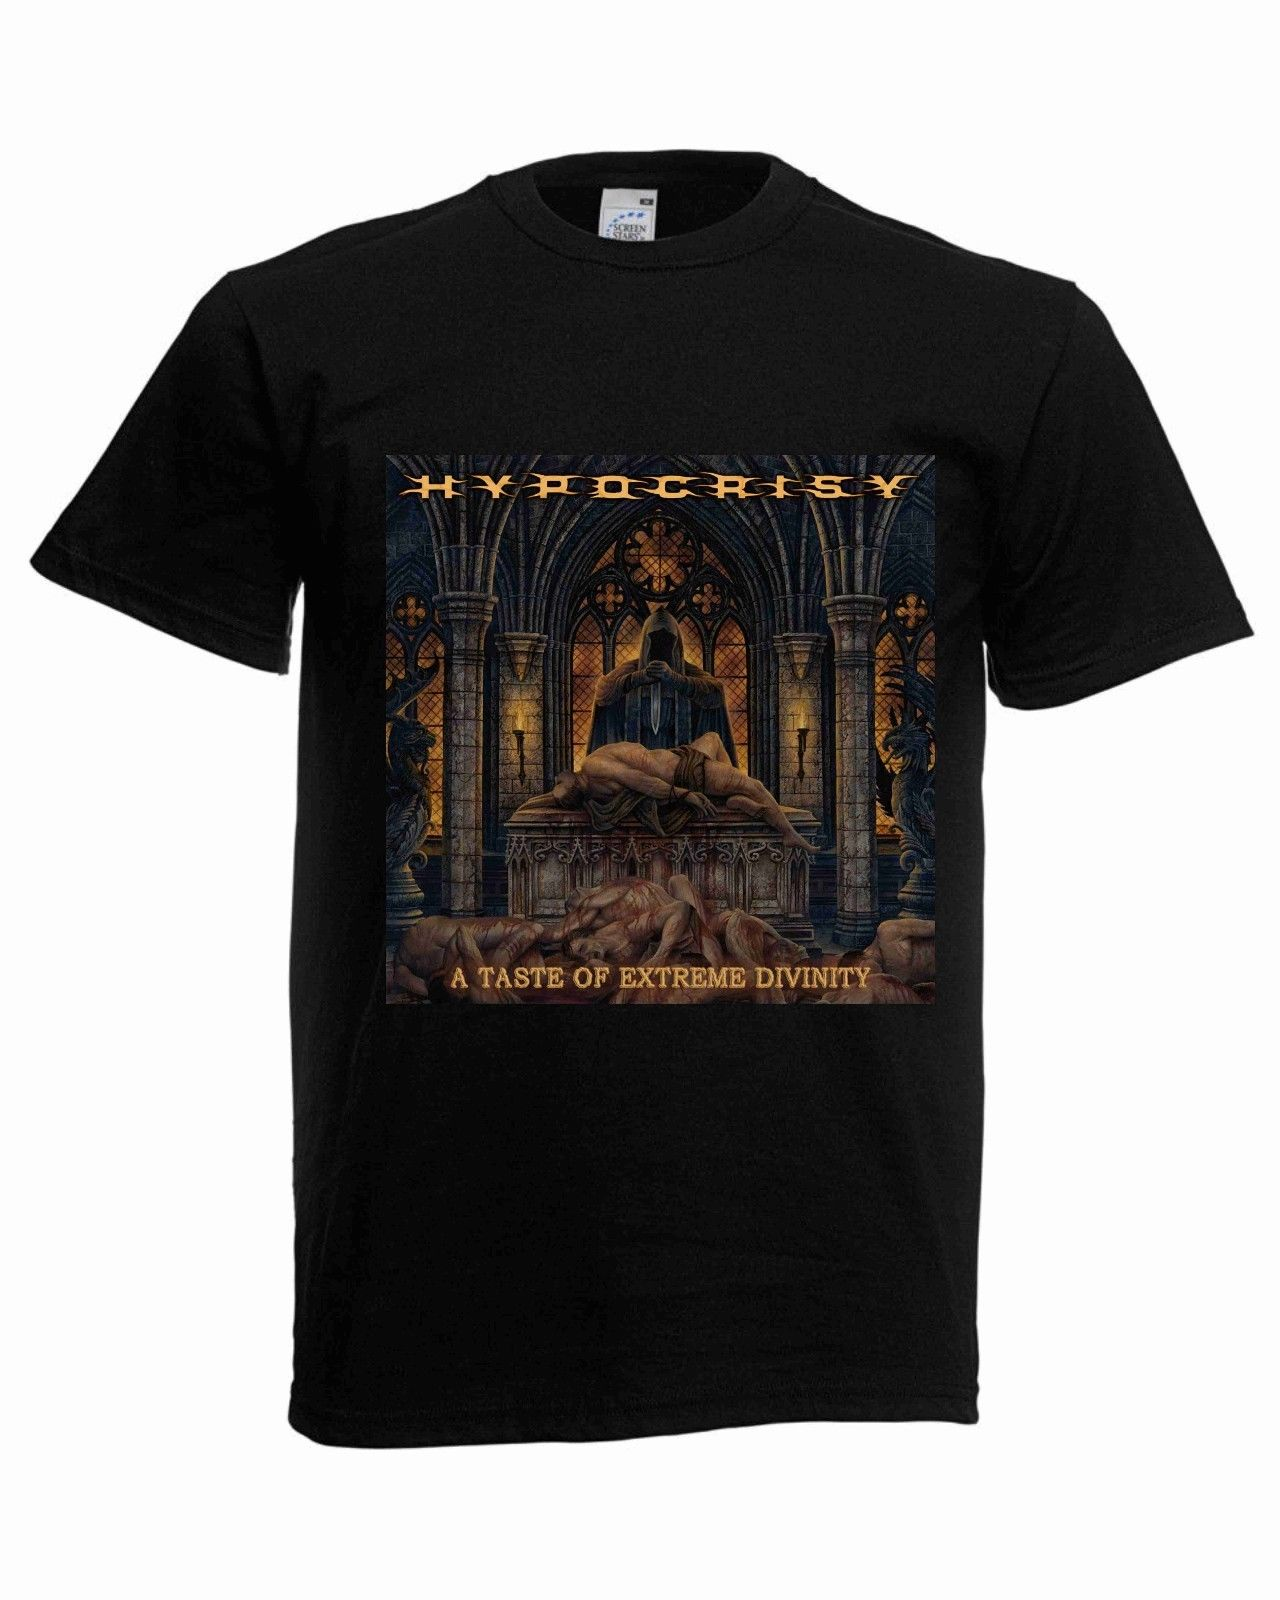 Hypocrisy T-shirt,Metal Men  t shirt different sizes,Metal Fan Shirt 1 New Fashion Casual Cotton Short-Sleeve